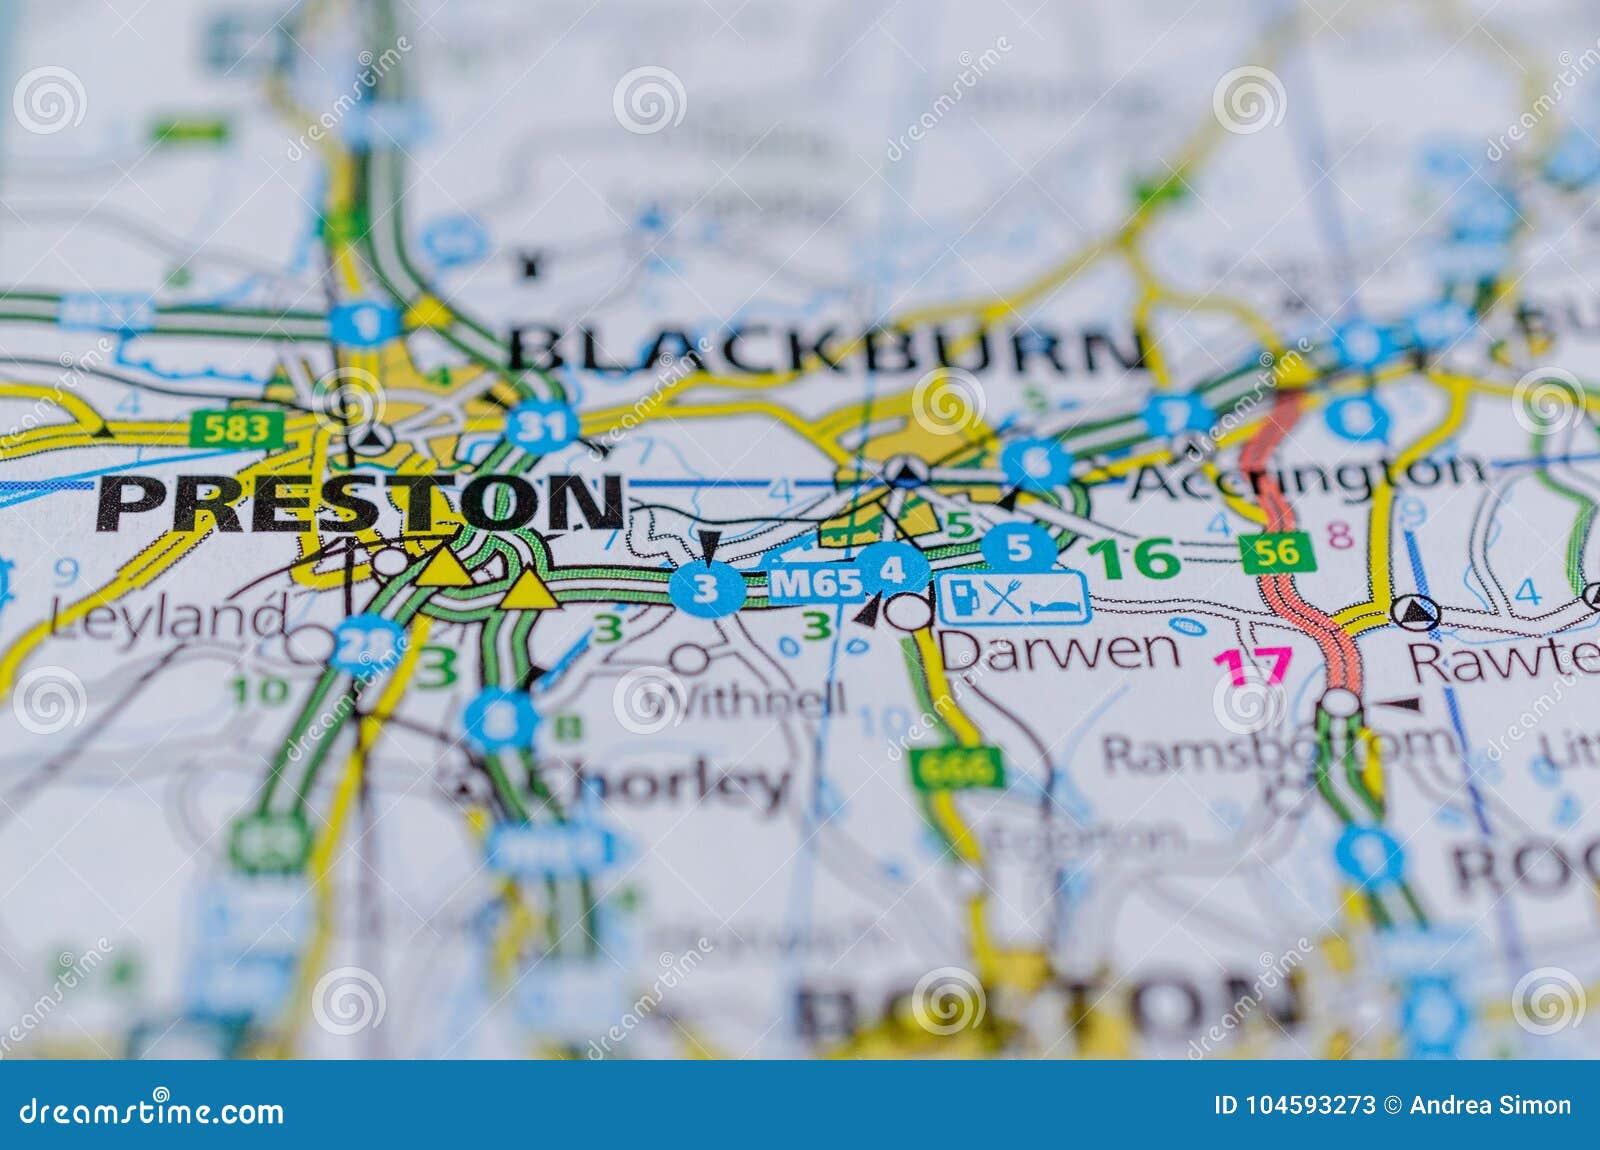 Preston England Map.Preston On Map Stock Image Image Of Background Navigation 104593273